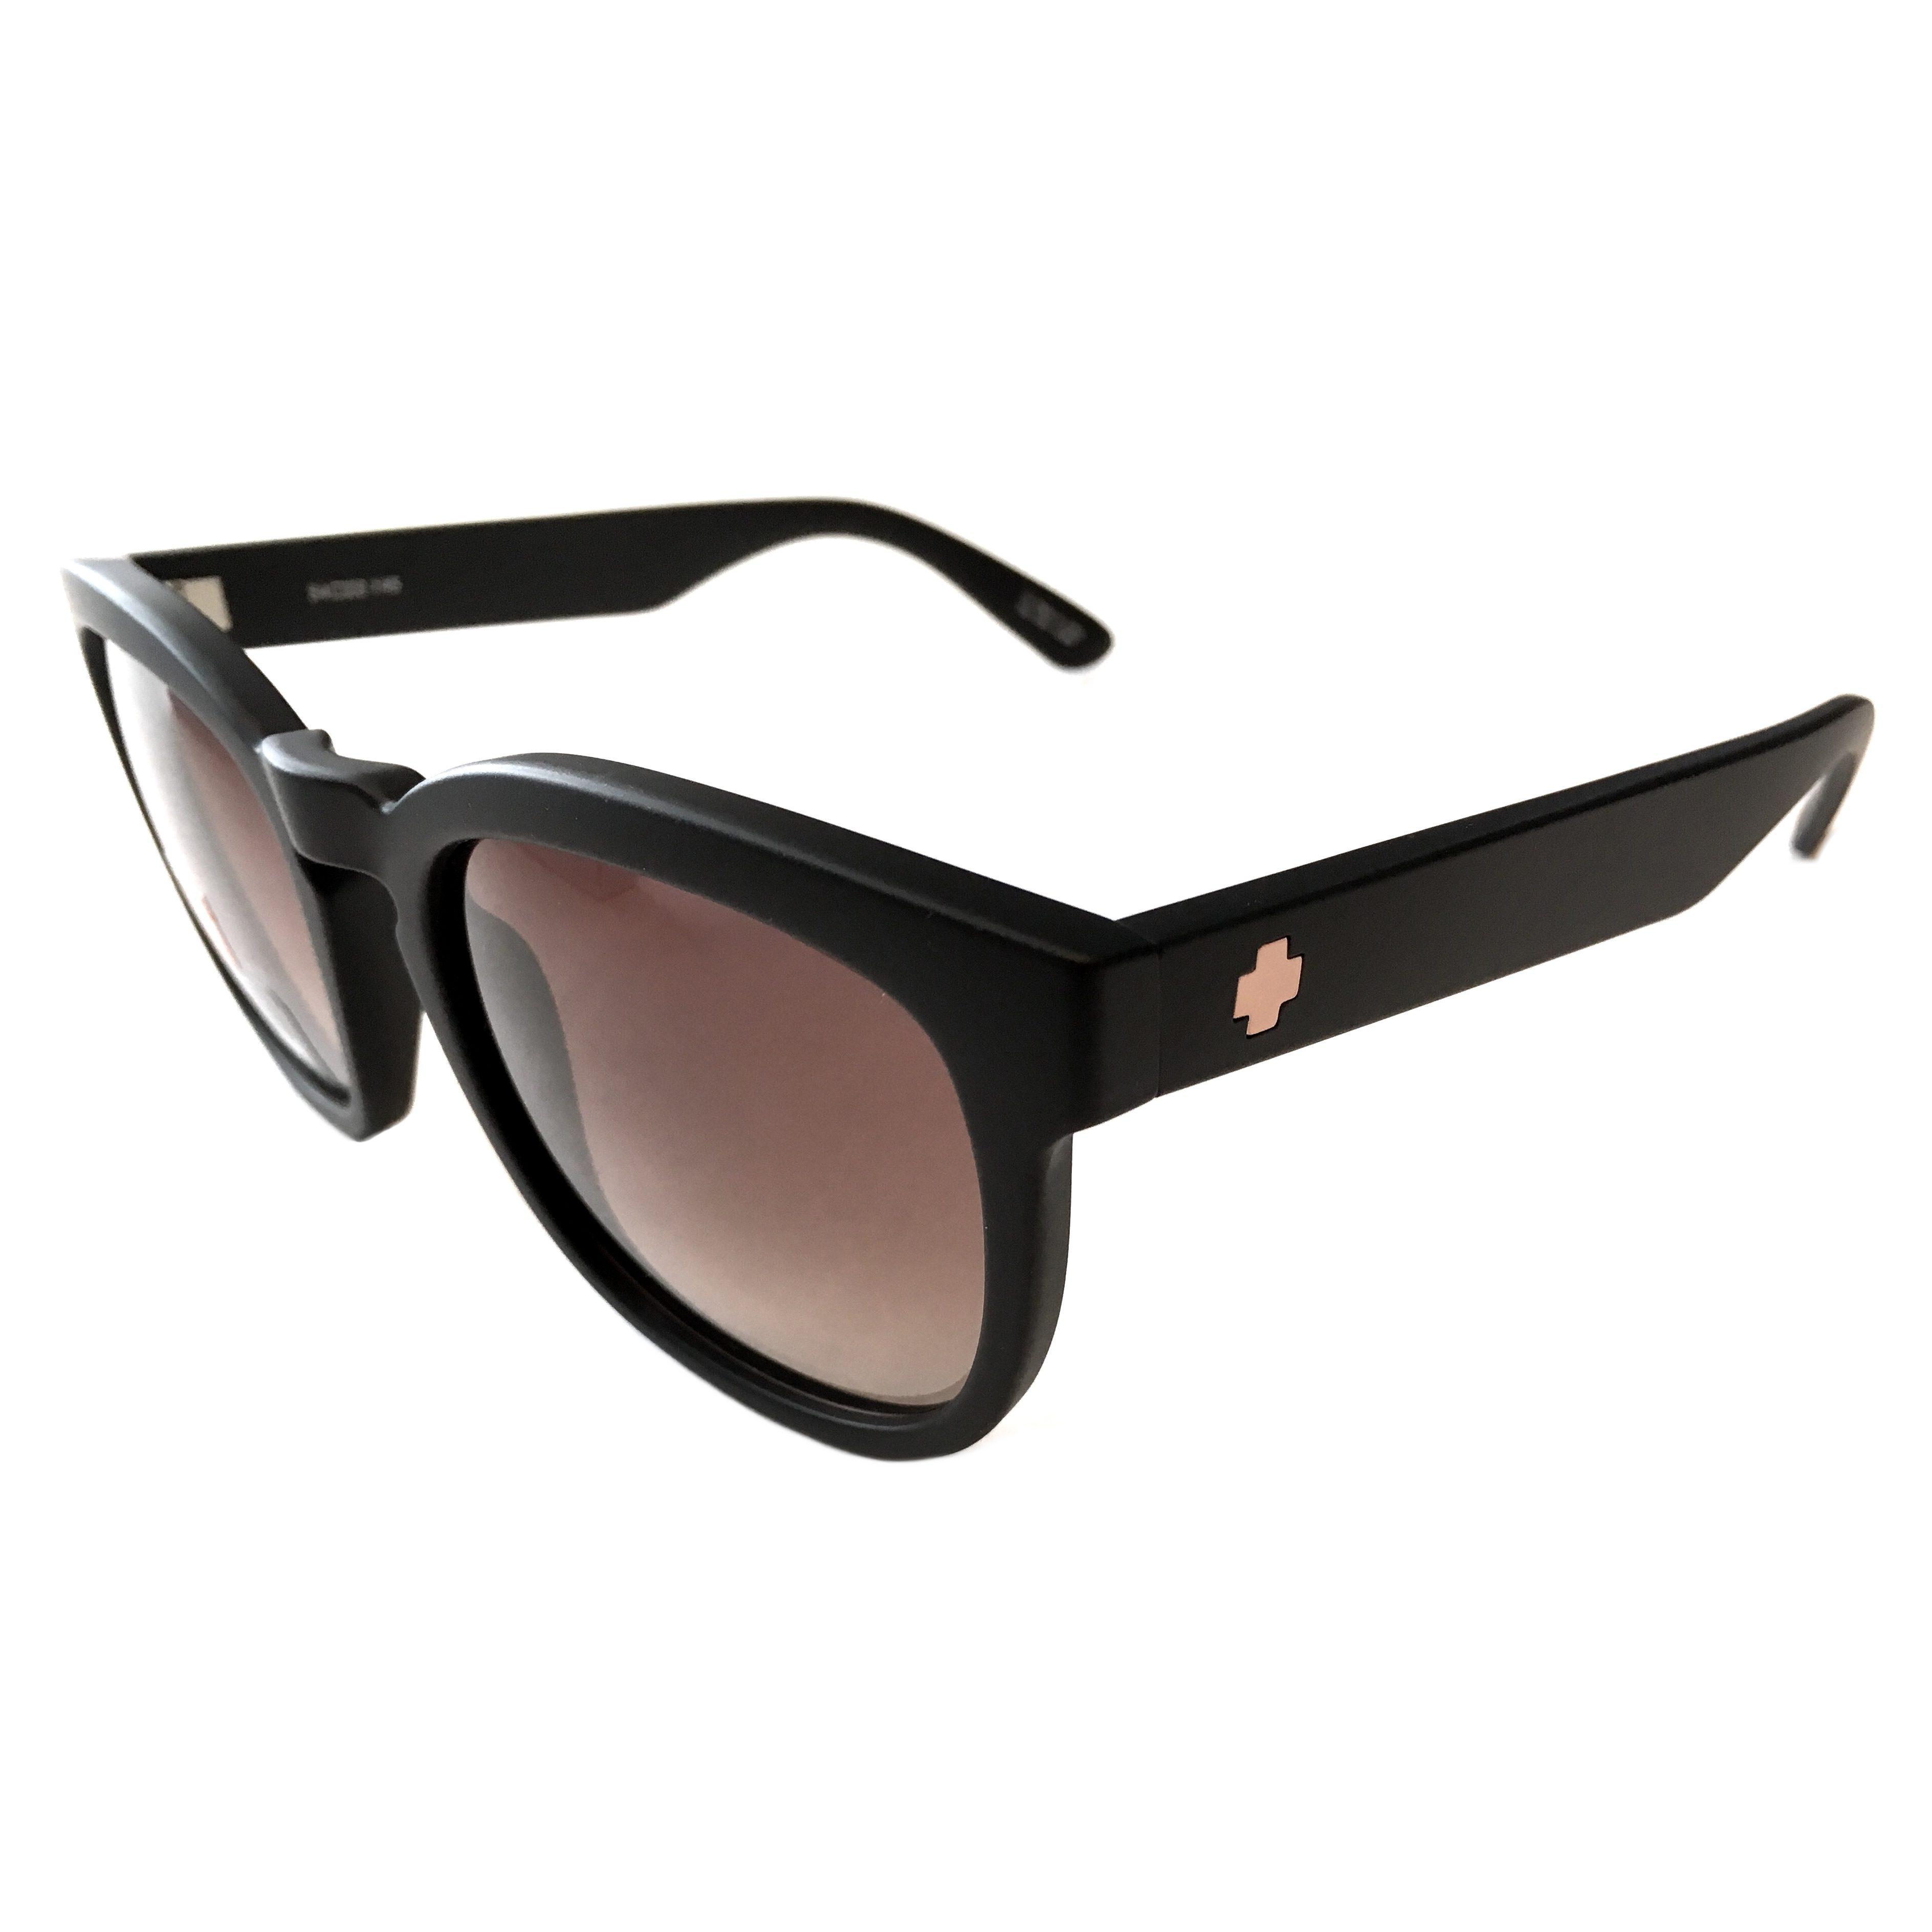 6fe2613dced Spy Optics Quinn Sunglasses – Femme Fatale Matte Black Fram – Bronze Fade  Happy Lens